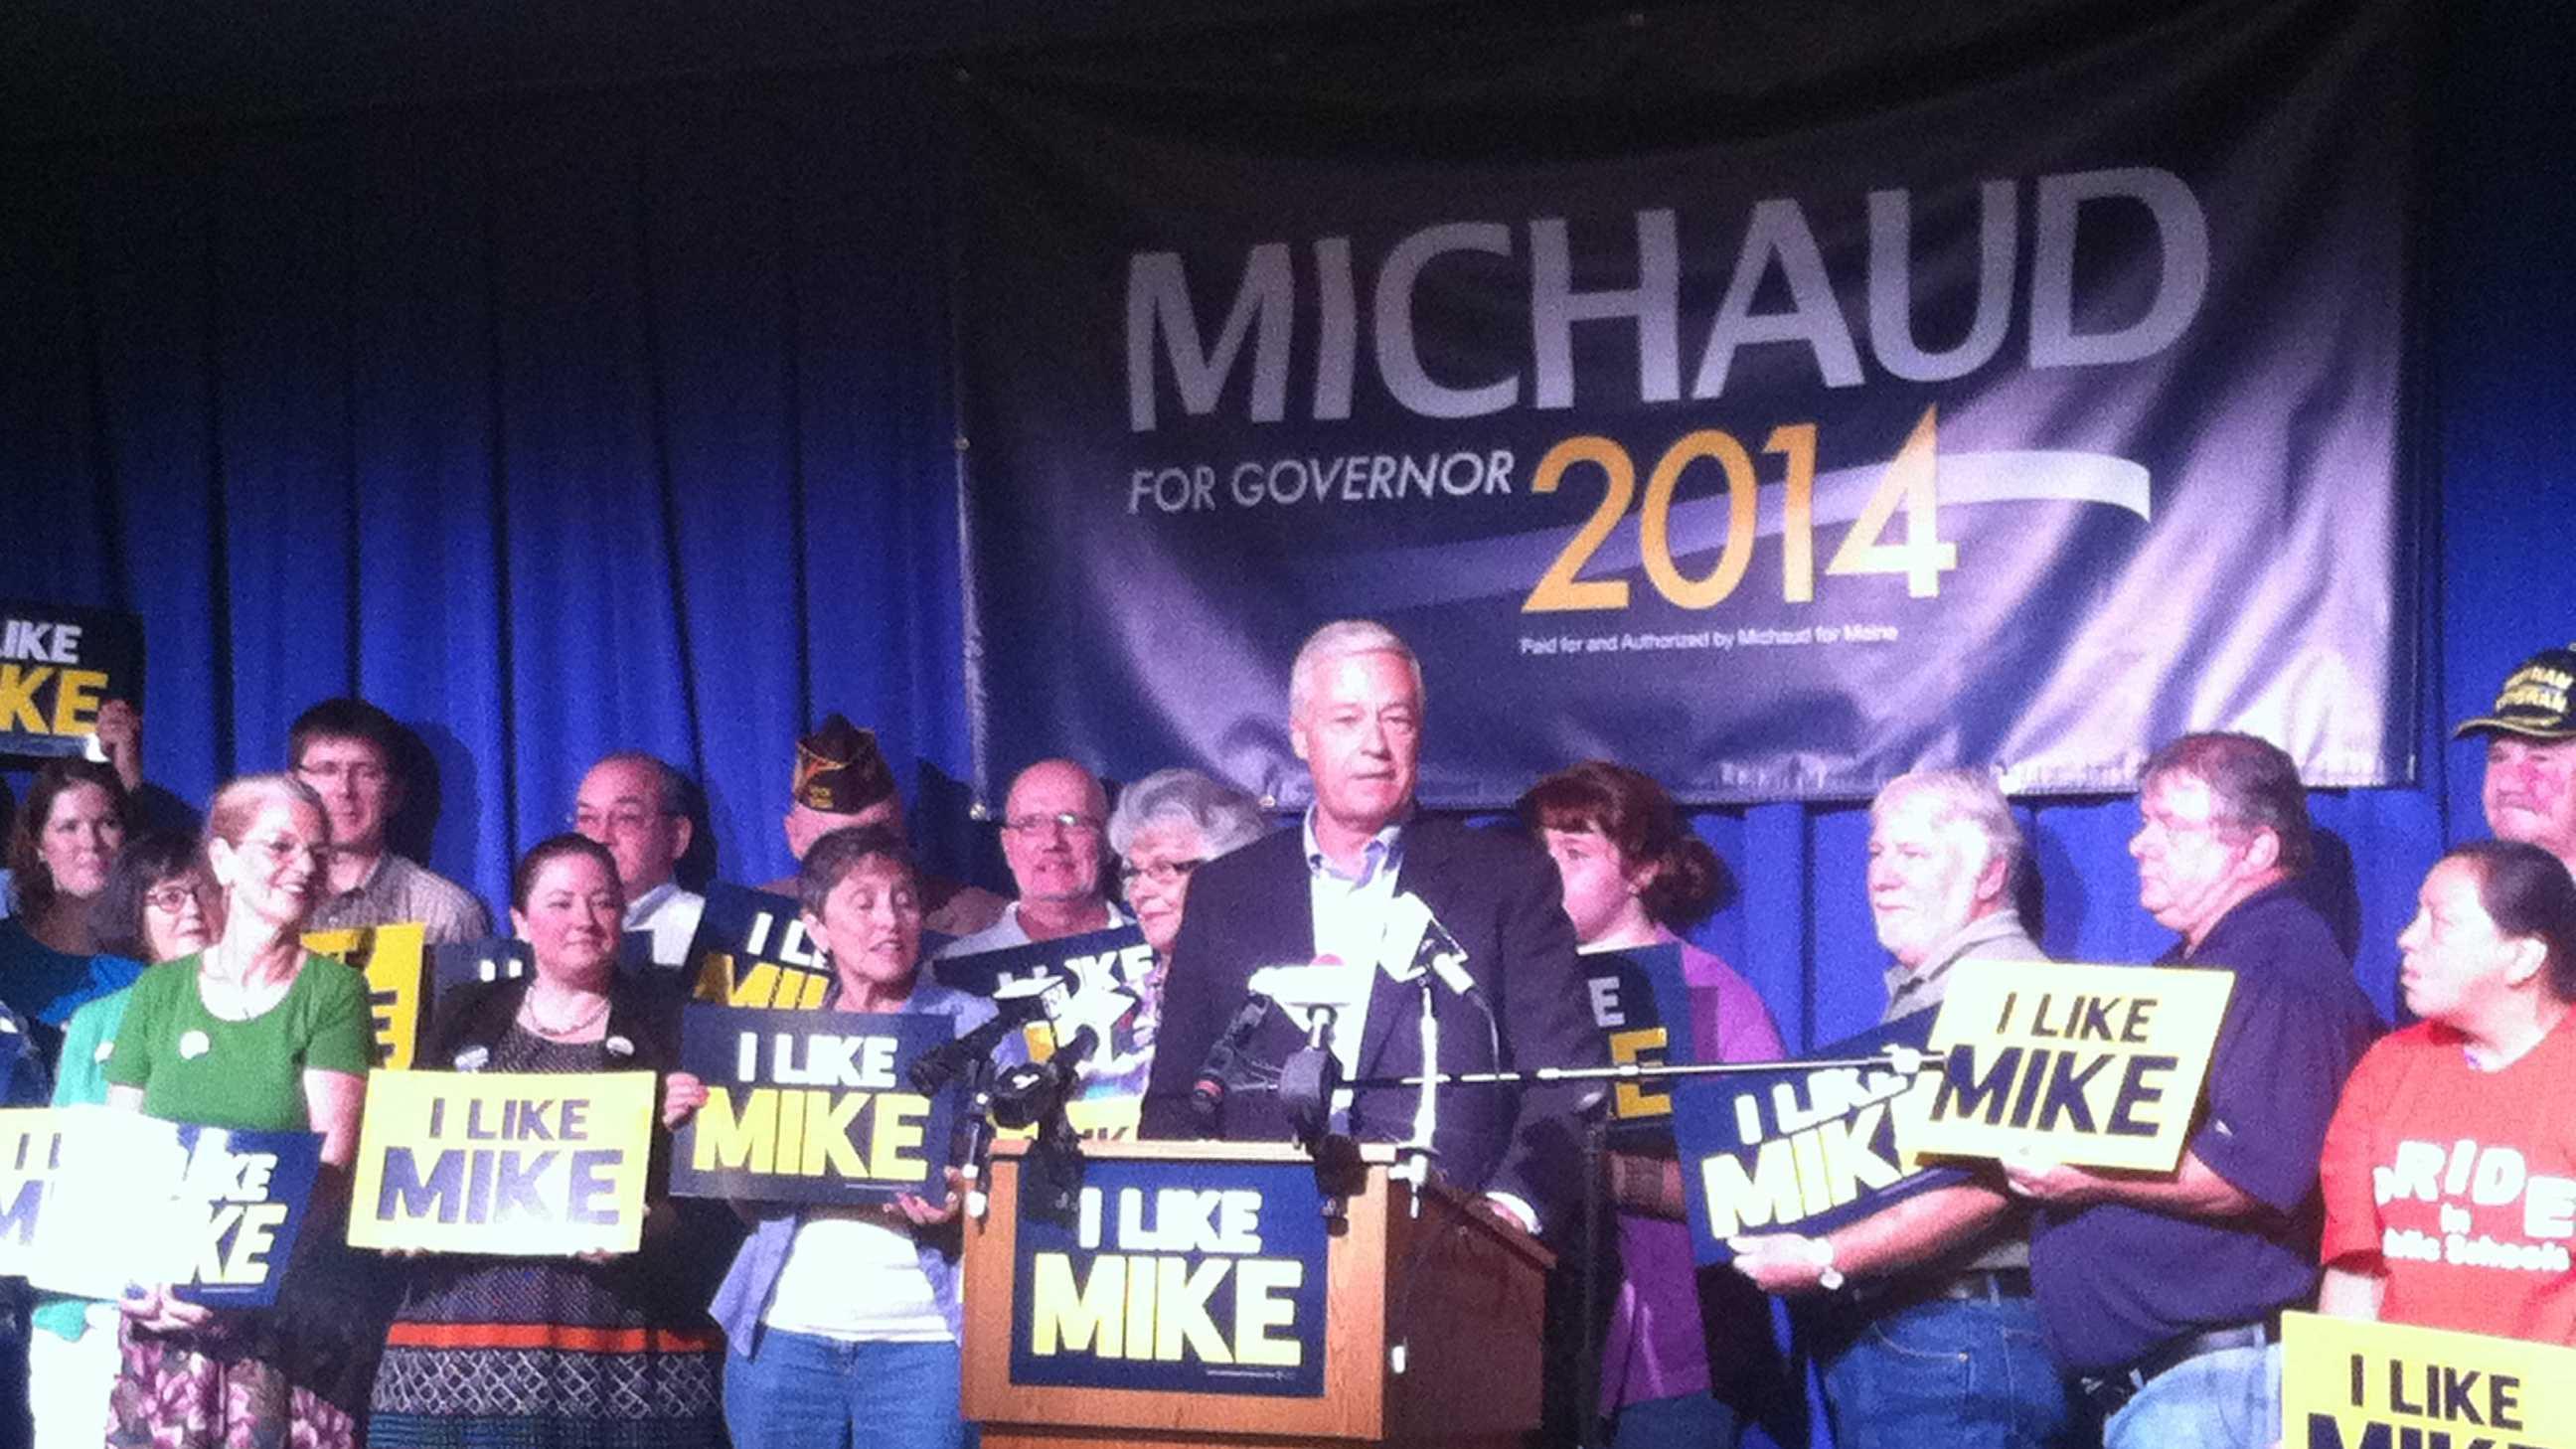 Mike Michaud announces gubernatorial run